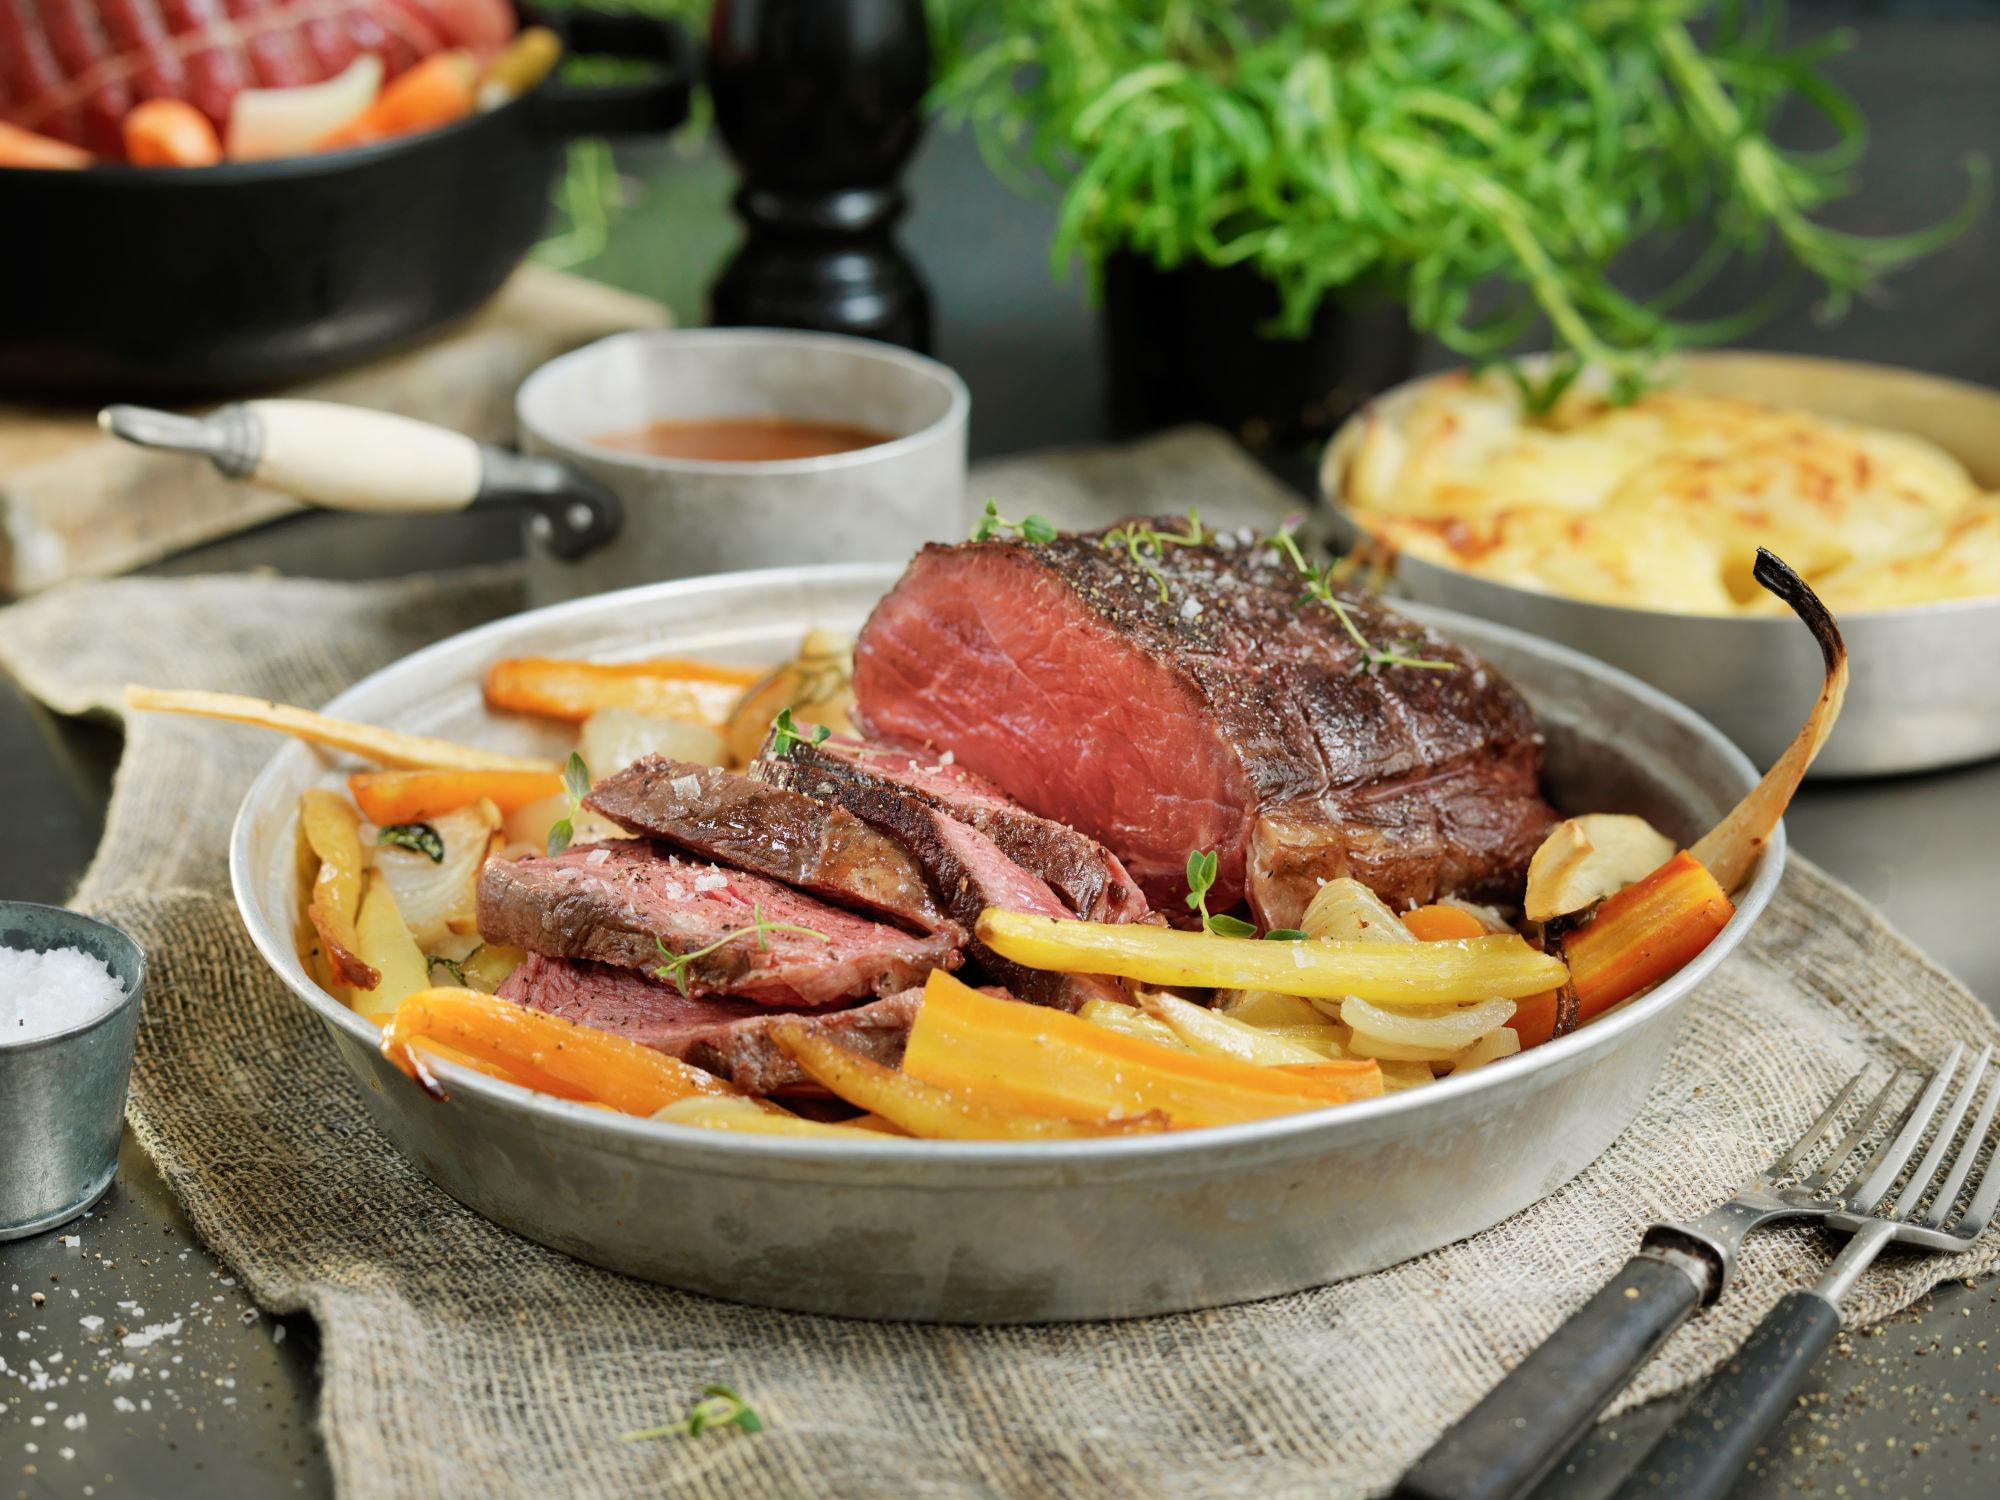 Boeuf  la mode, Roast beef, Rinderbraten, Ingredient, Meat, Cuisine, Food, Dish